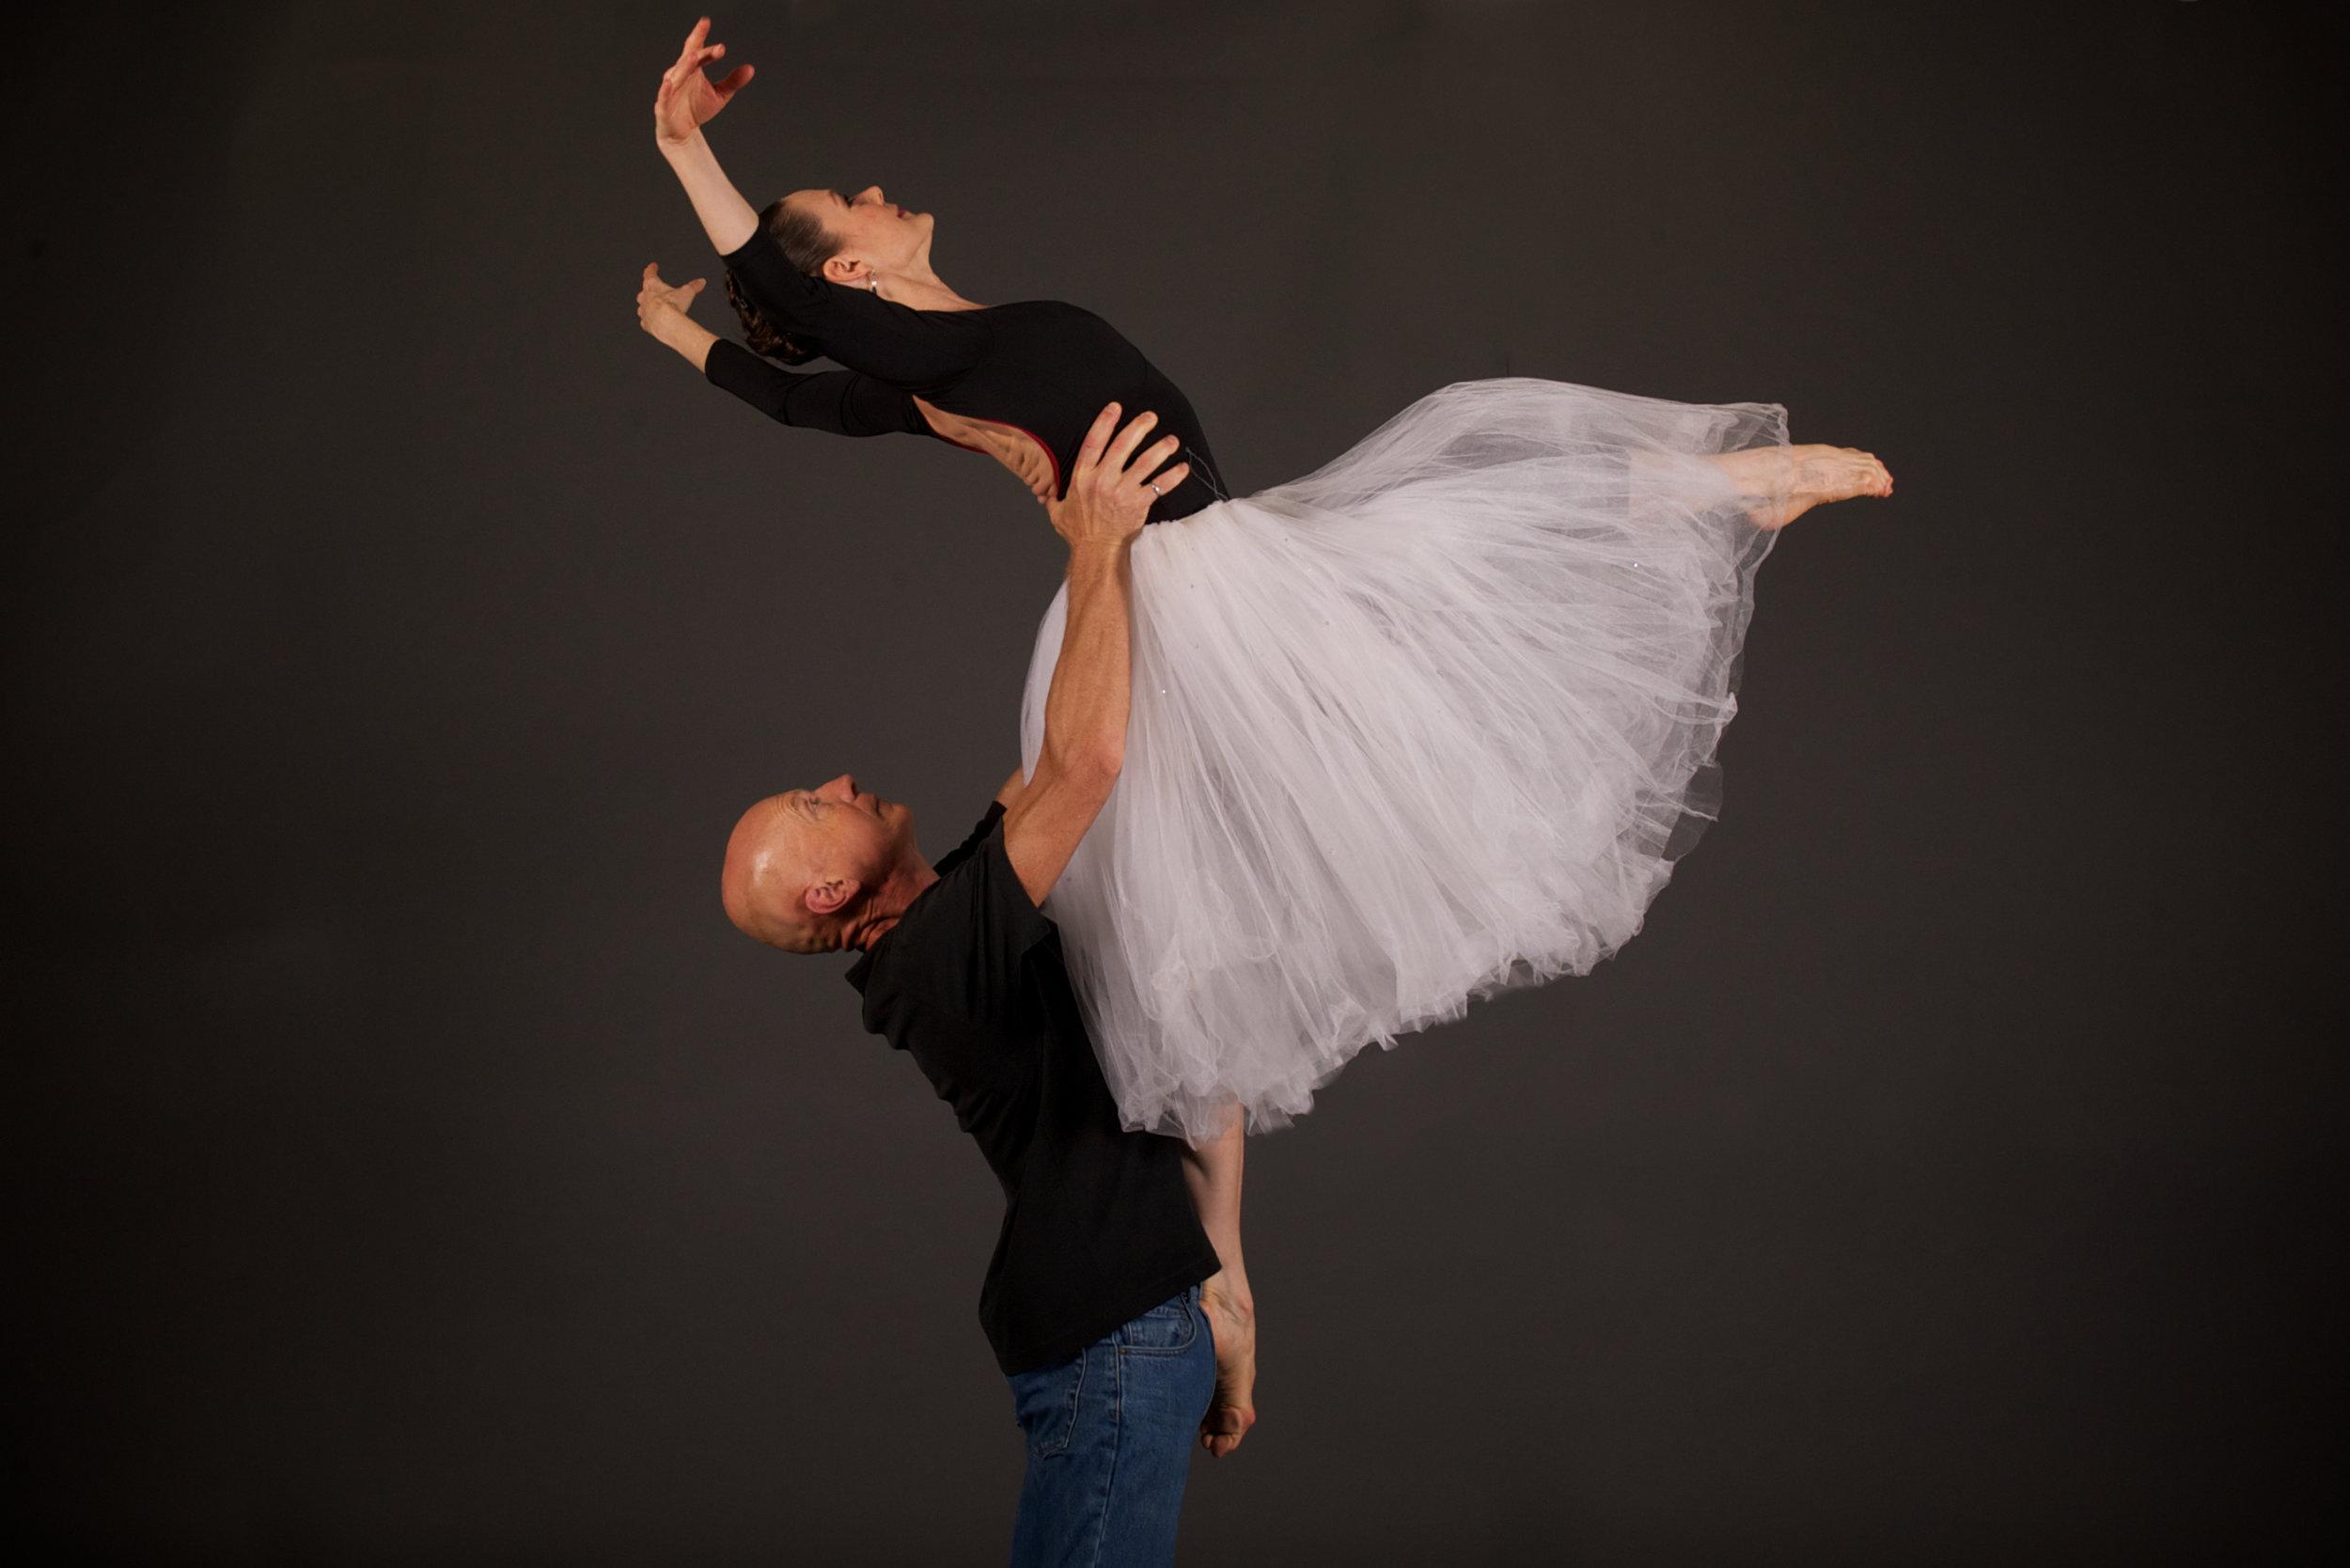 Founding Ballet Magnificat Artistic Director Kathy Thibodeaux